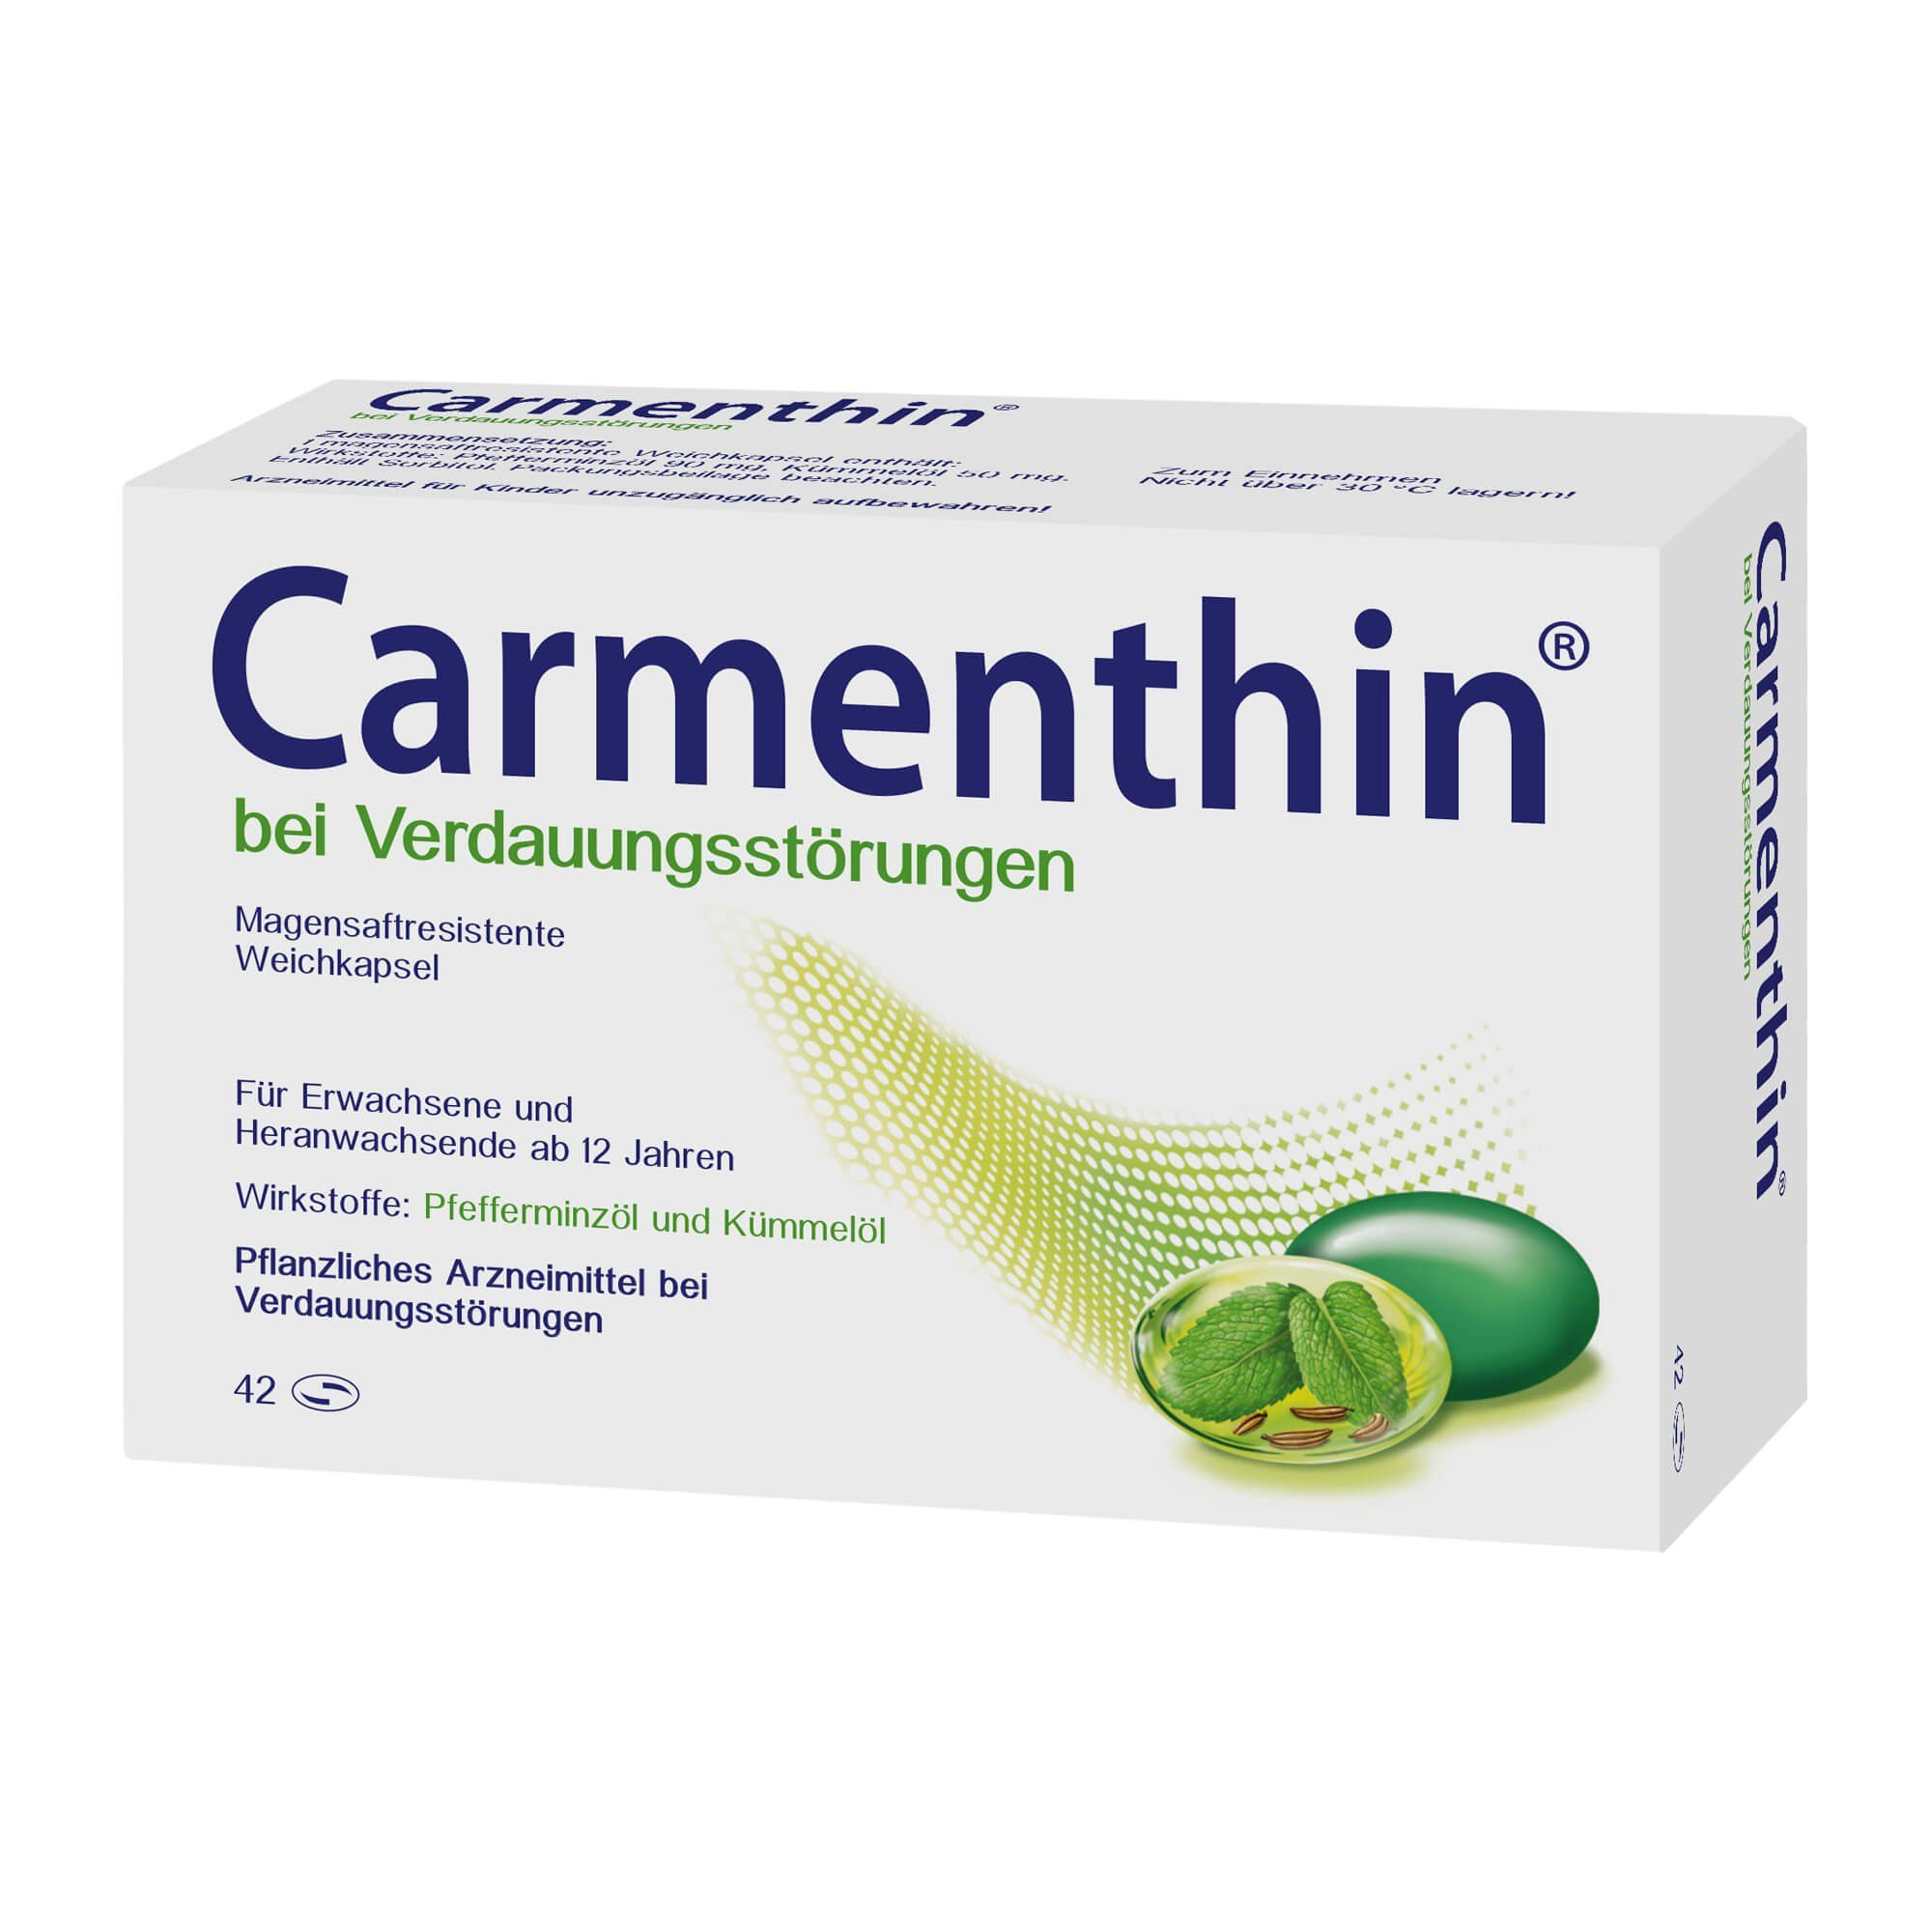 Carmenthin bei Verdauungsstörungen, 42 St